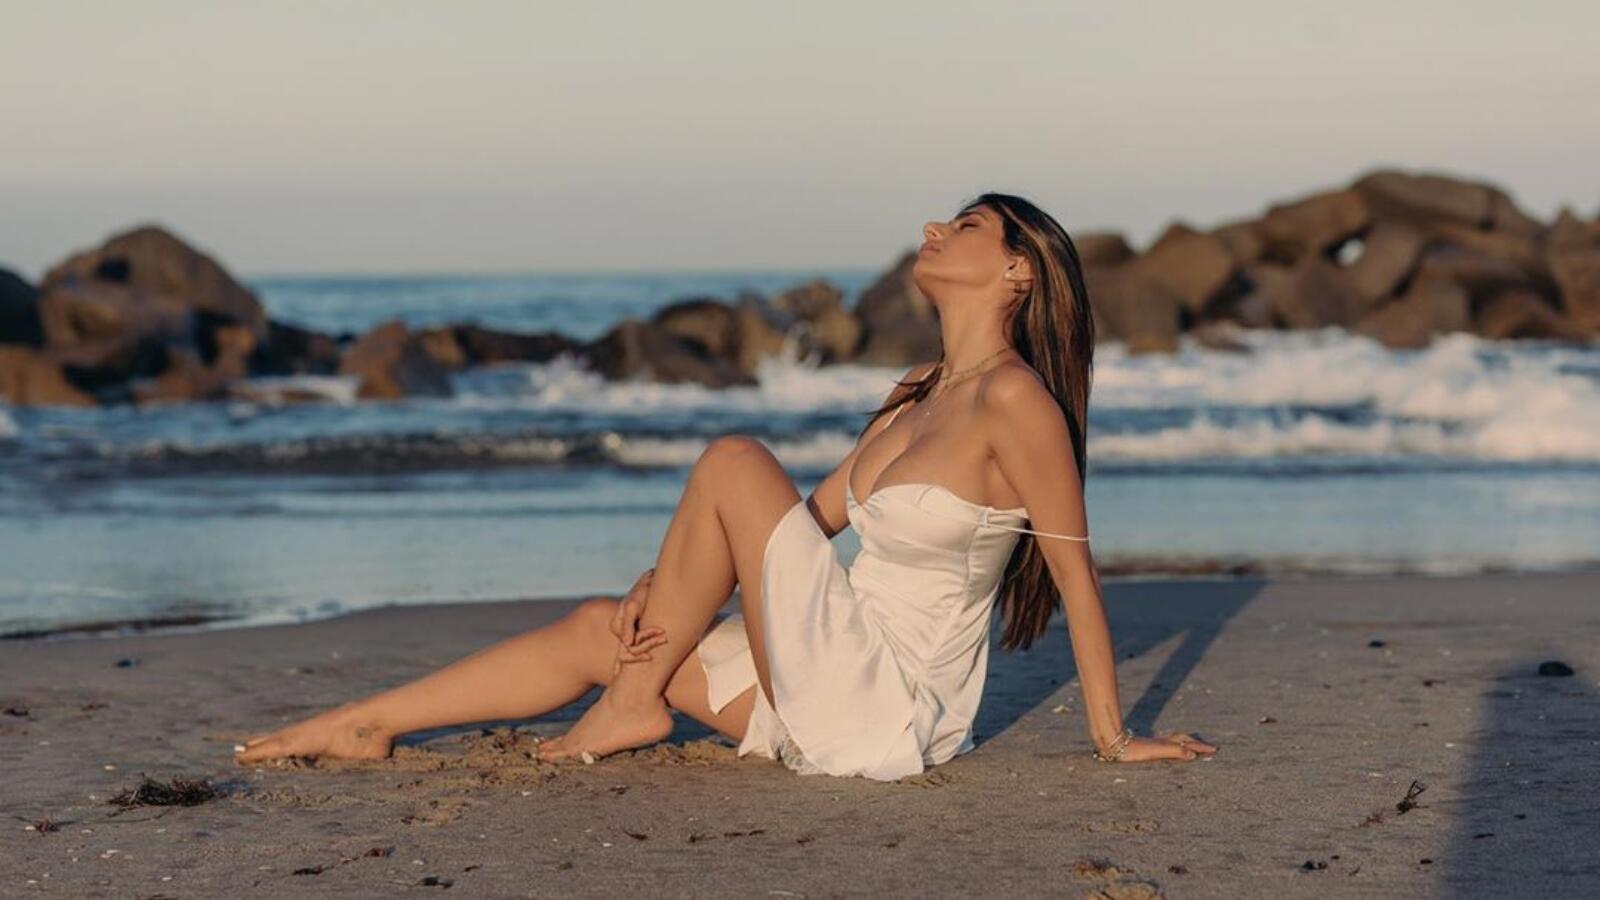 mia khalifa sexy beach 4k wallpaper 62085